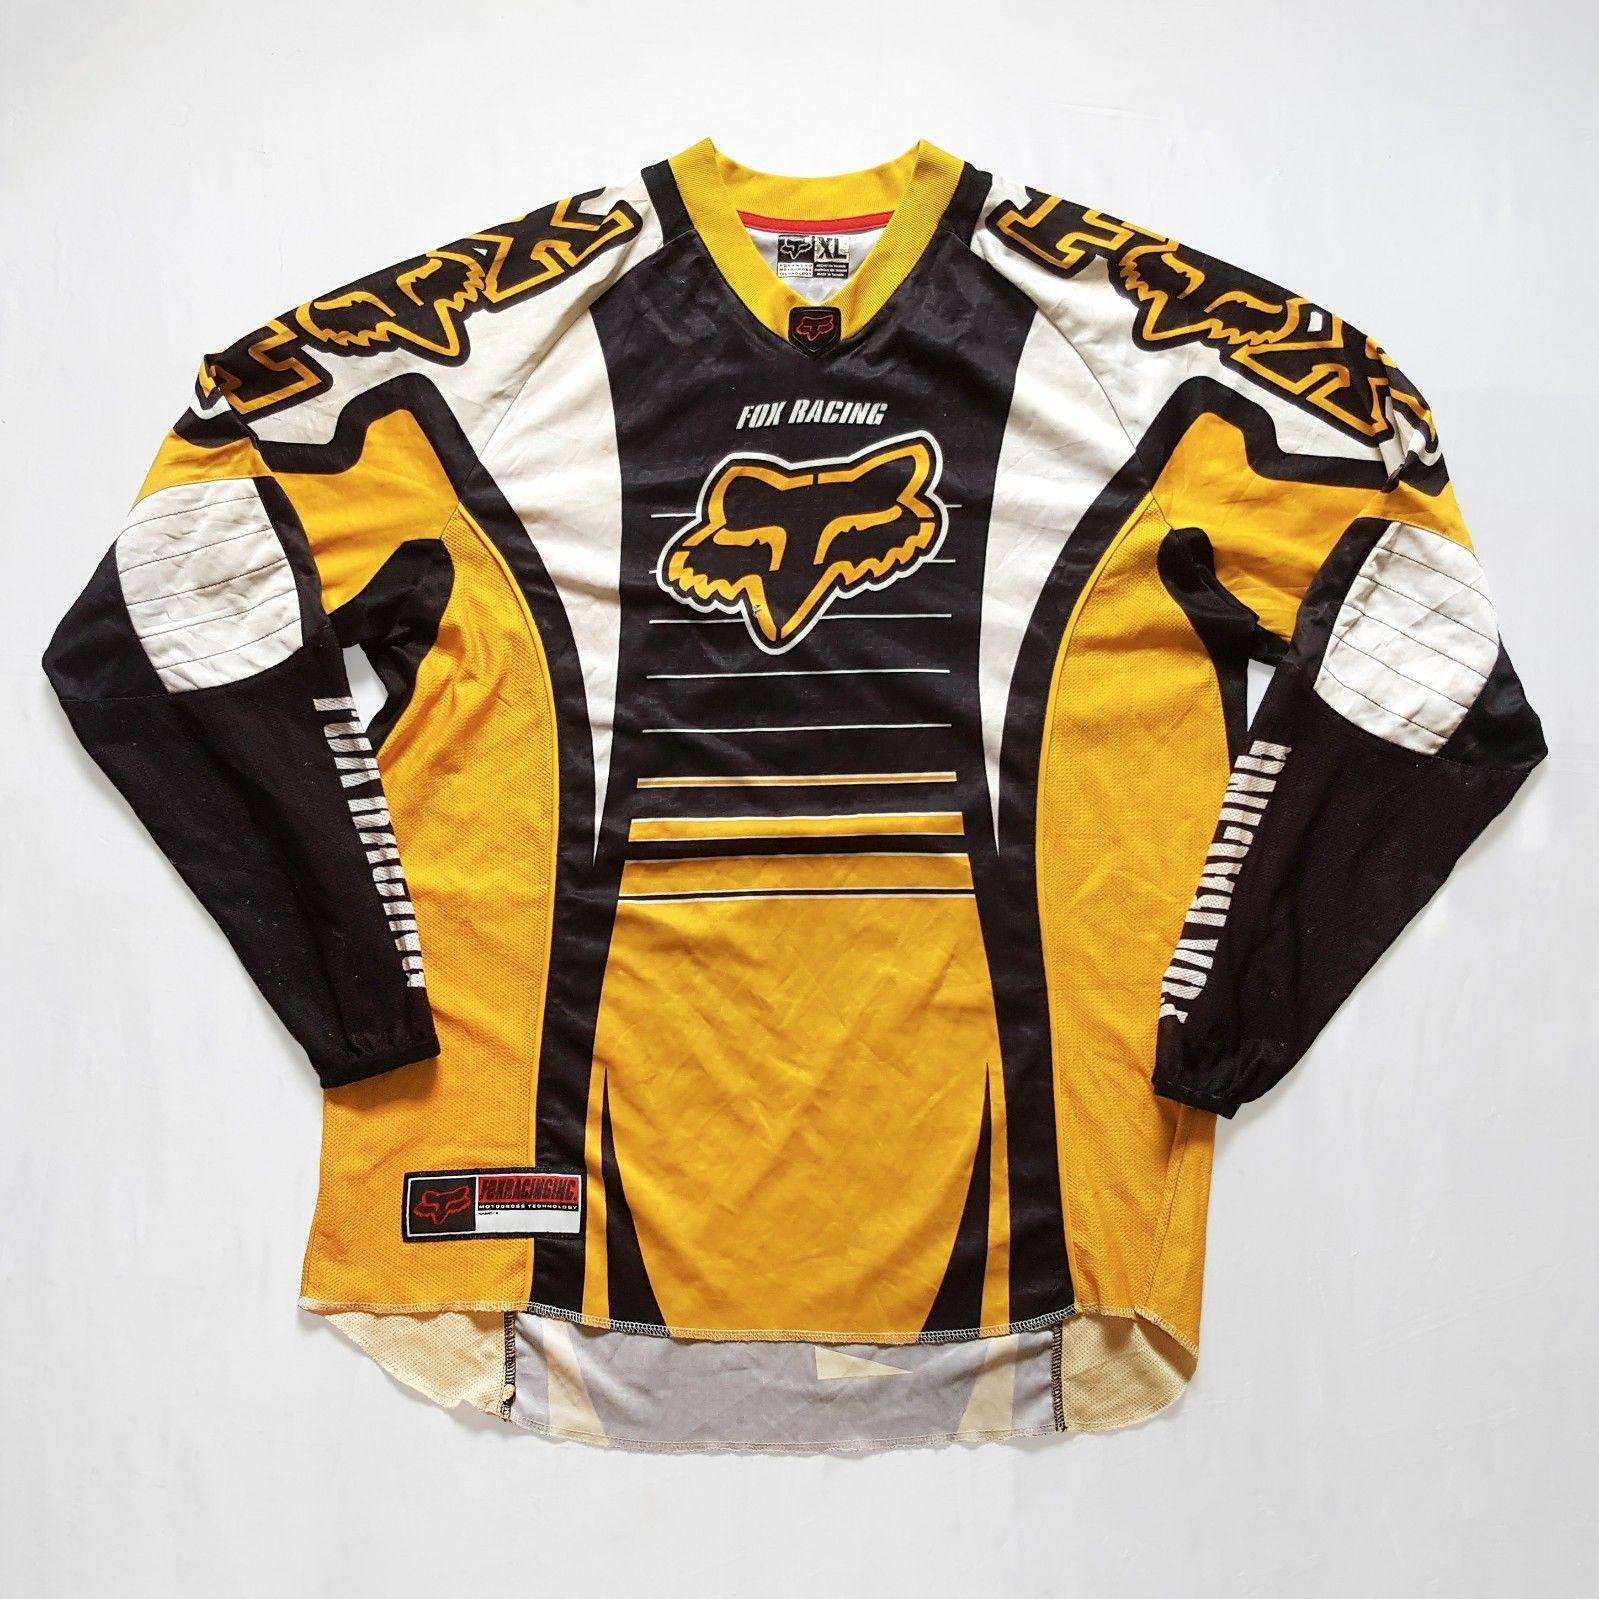 Vtg 90s Motocross Fox Racing Team D2 Long Sleeve Jersey Dirt Bike MX ... c251e0debd25